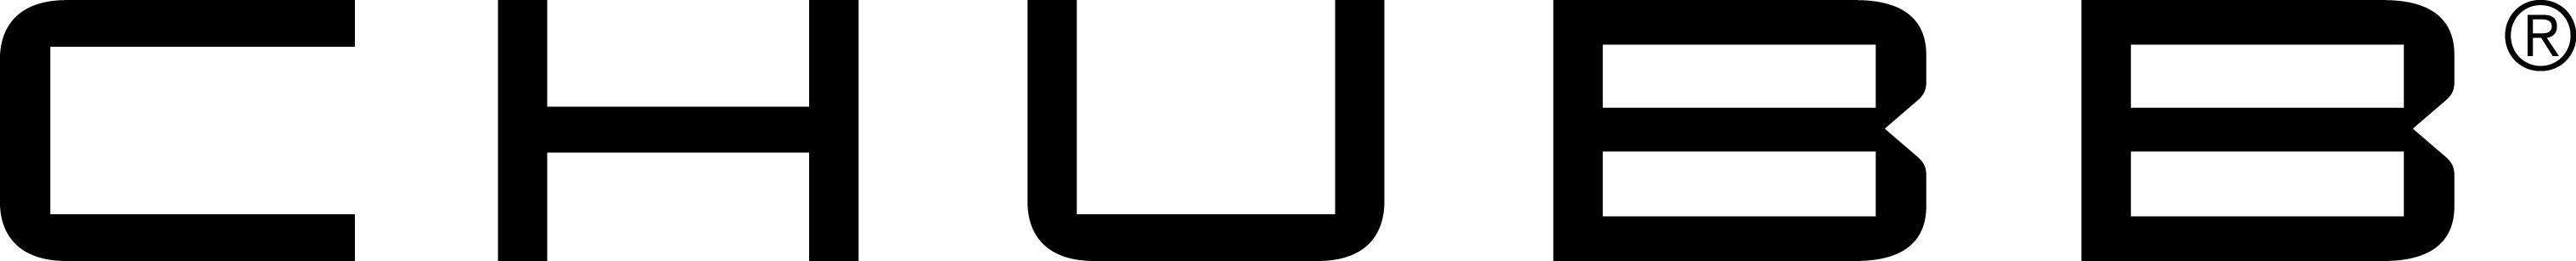 CHUBB Logo Black RBG